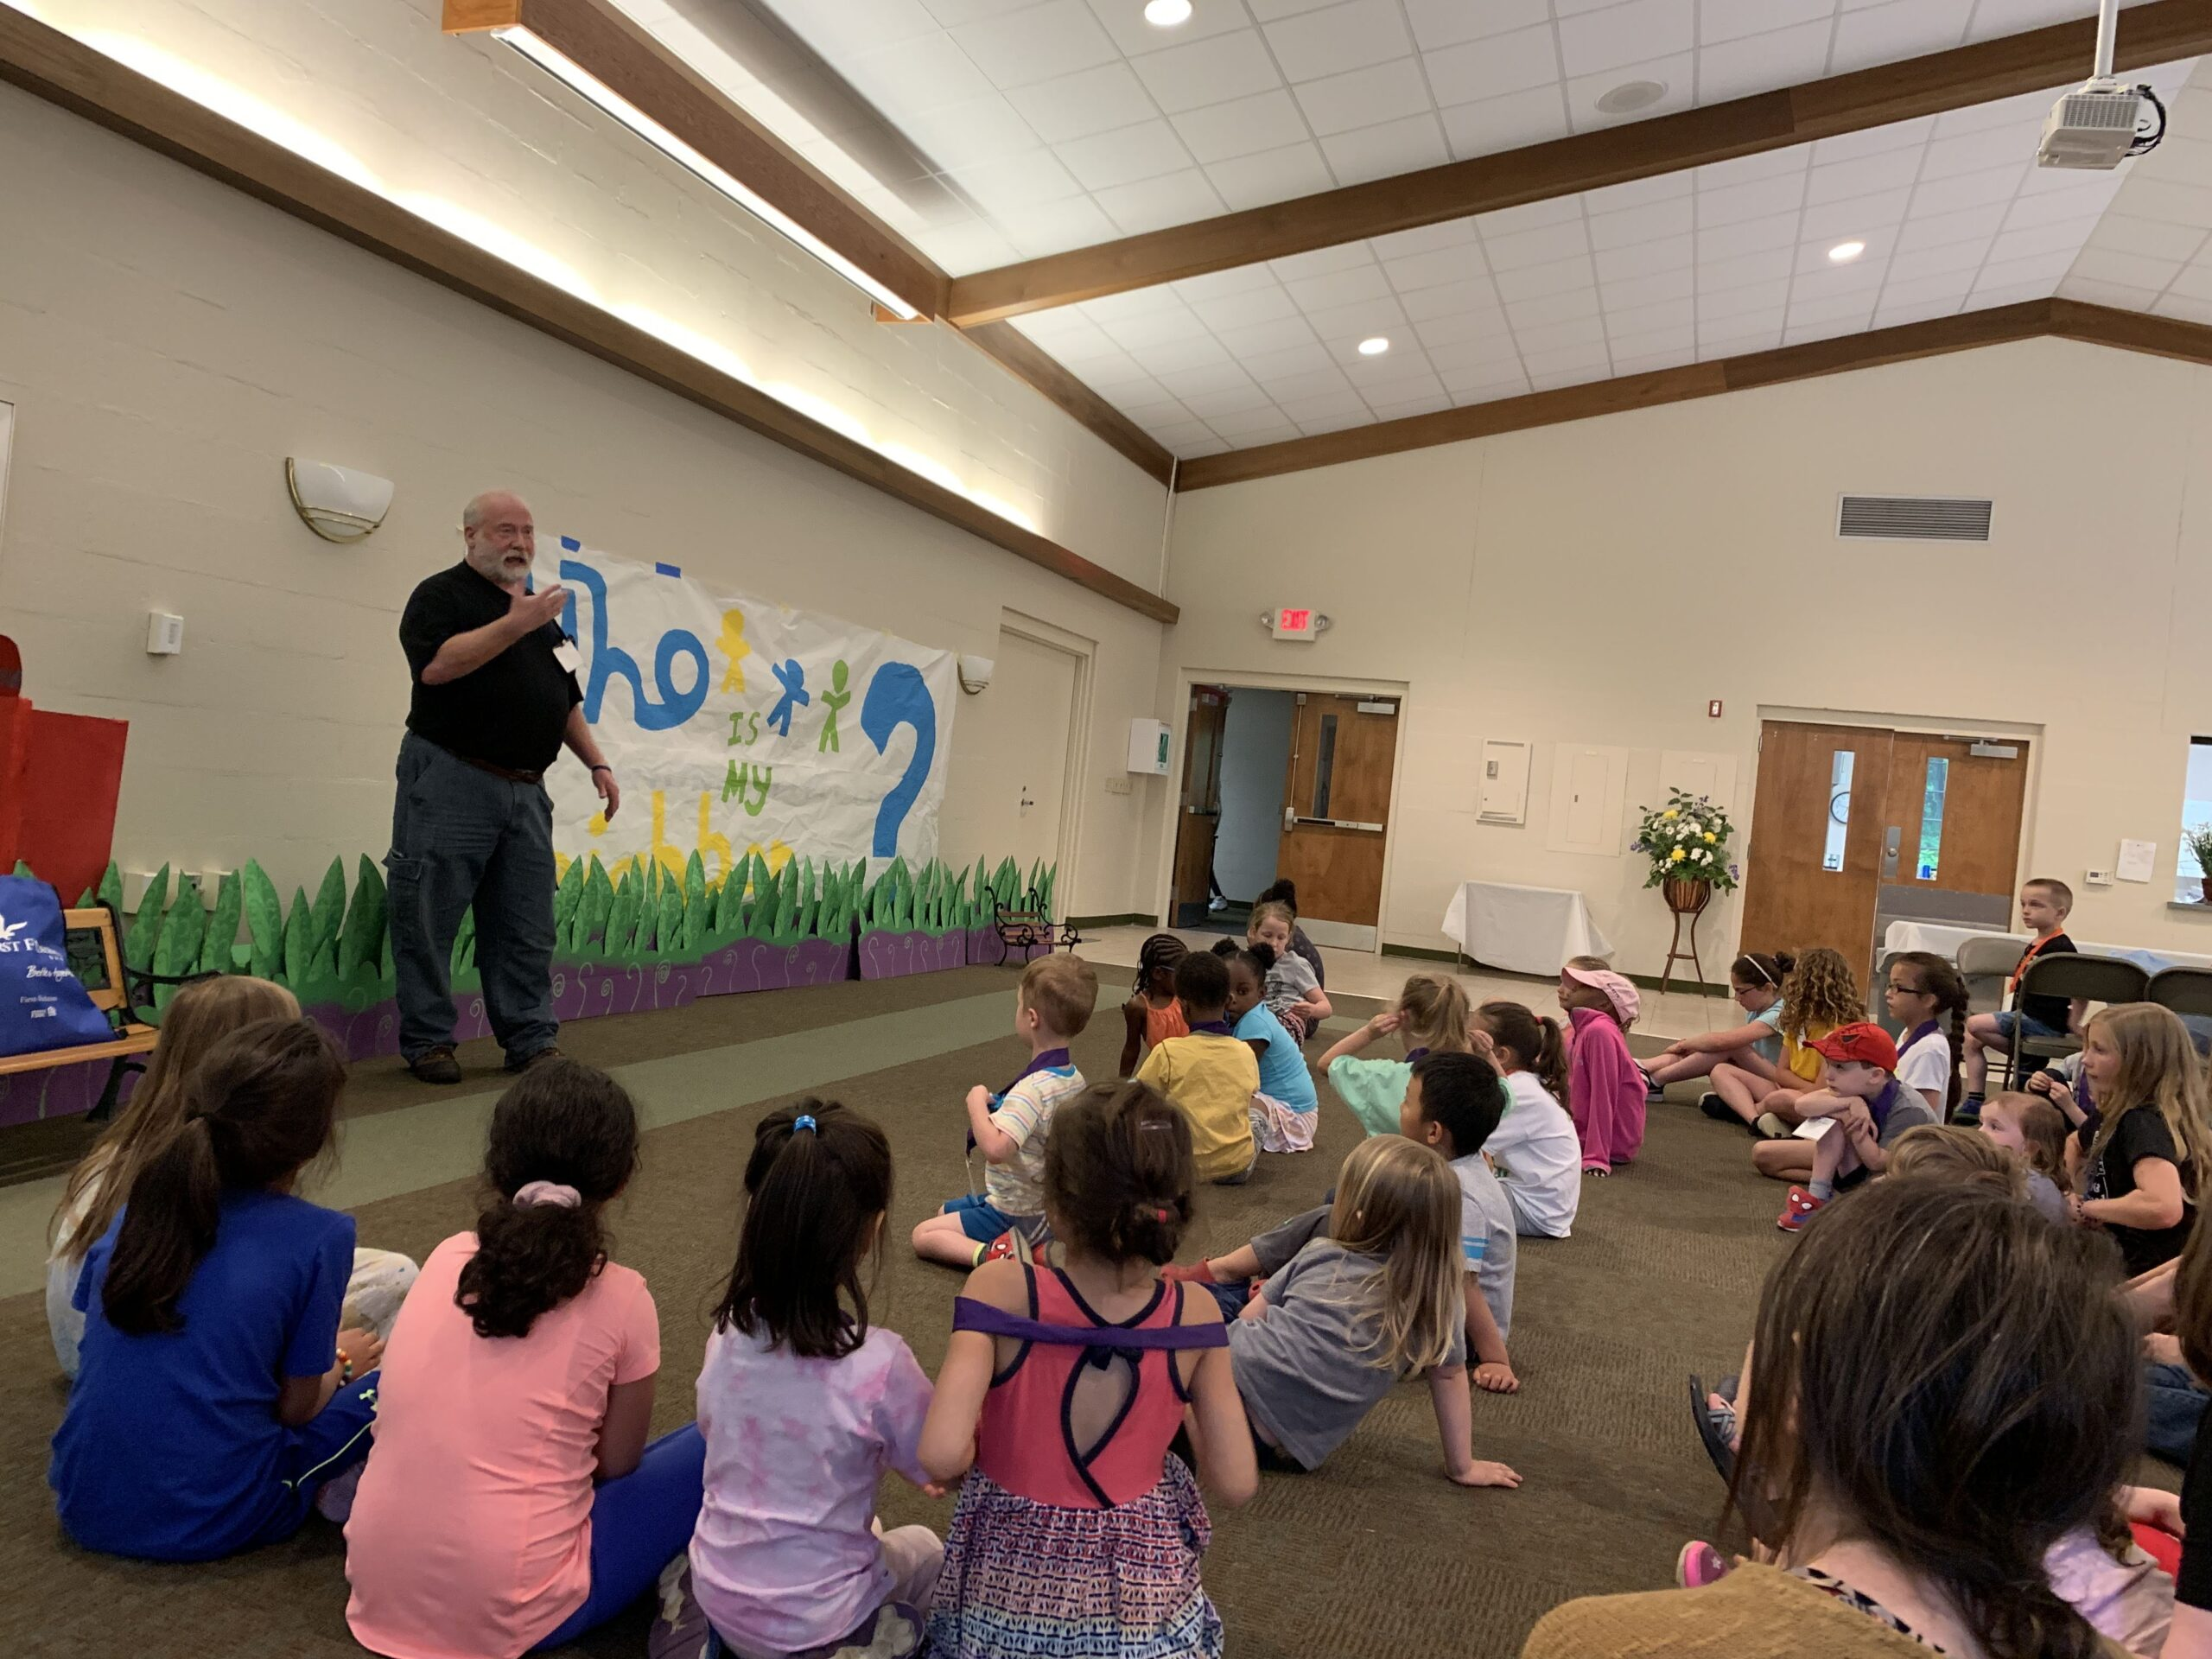 Mr. Scott Hendircks teaching the parable of The Good Samaritan, VBSS